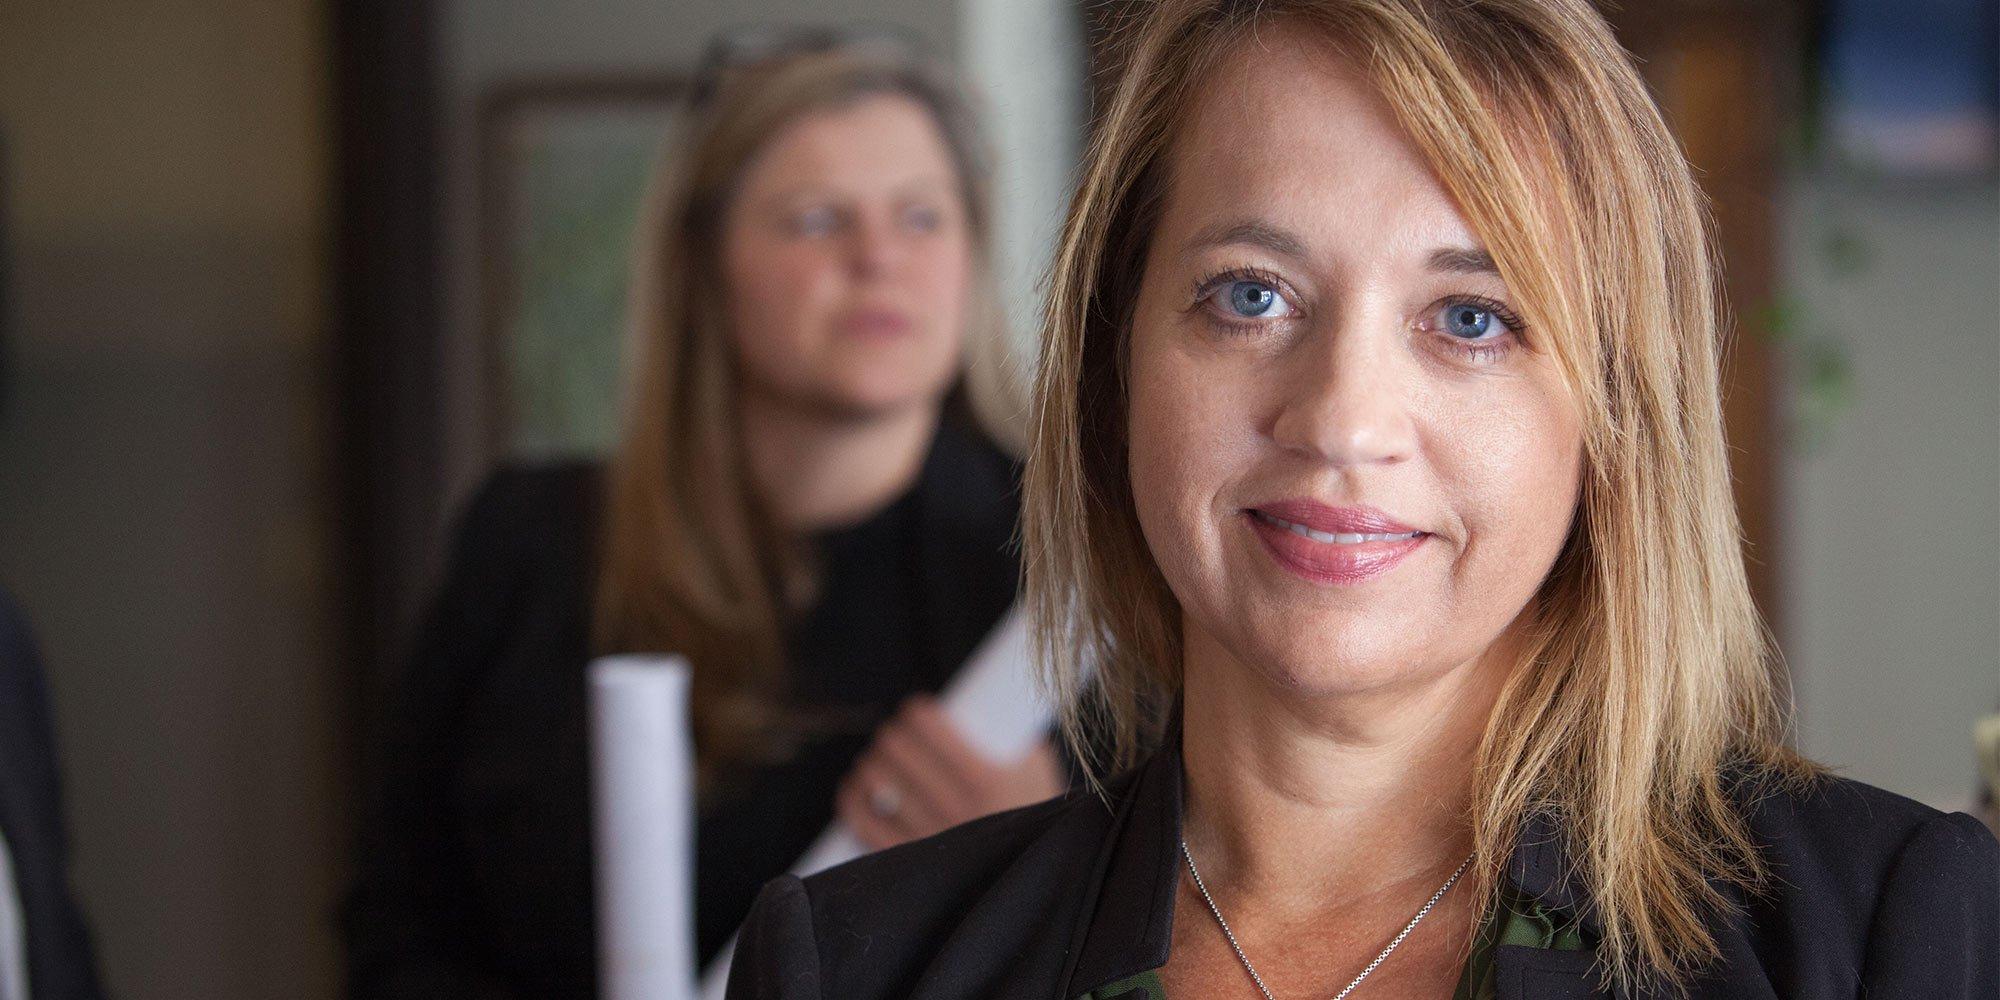 Attorney Kimberly Carpenter